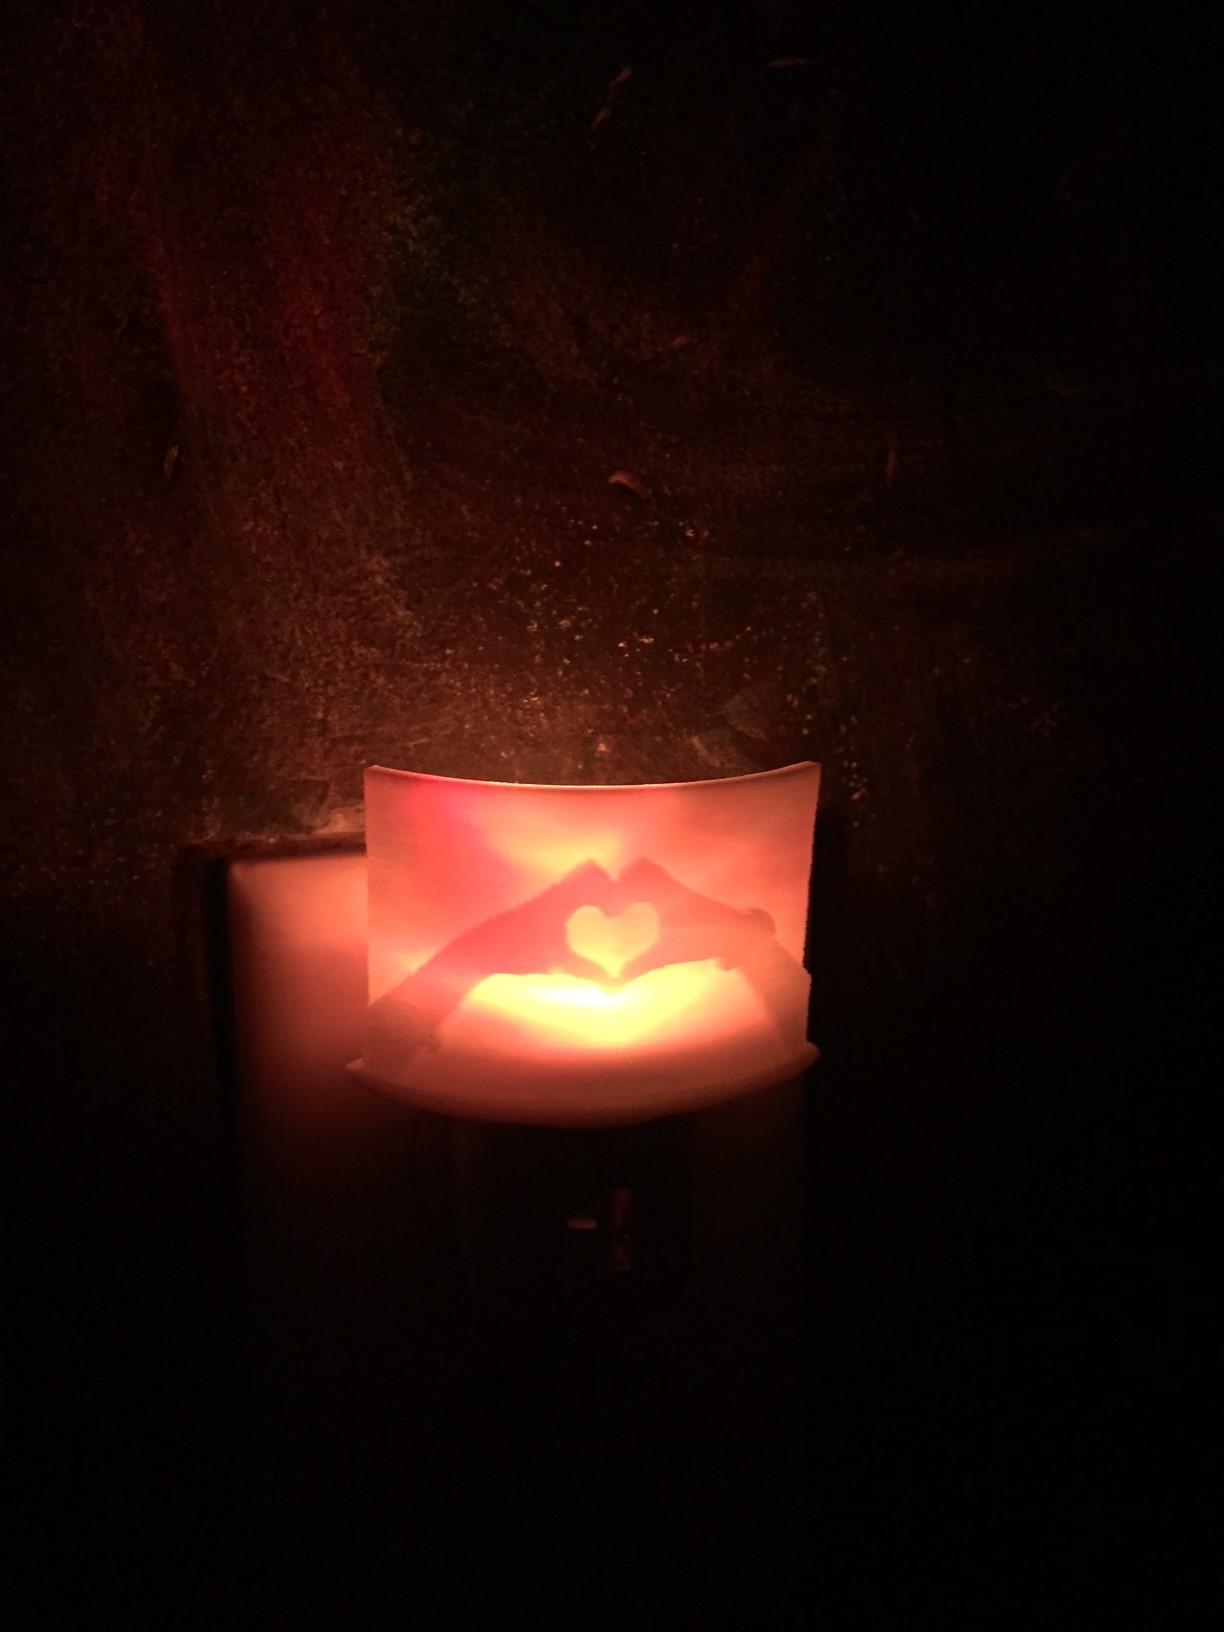 lithophane night light-lit red